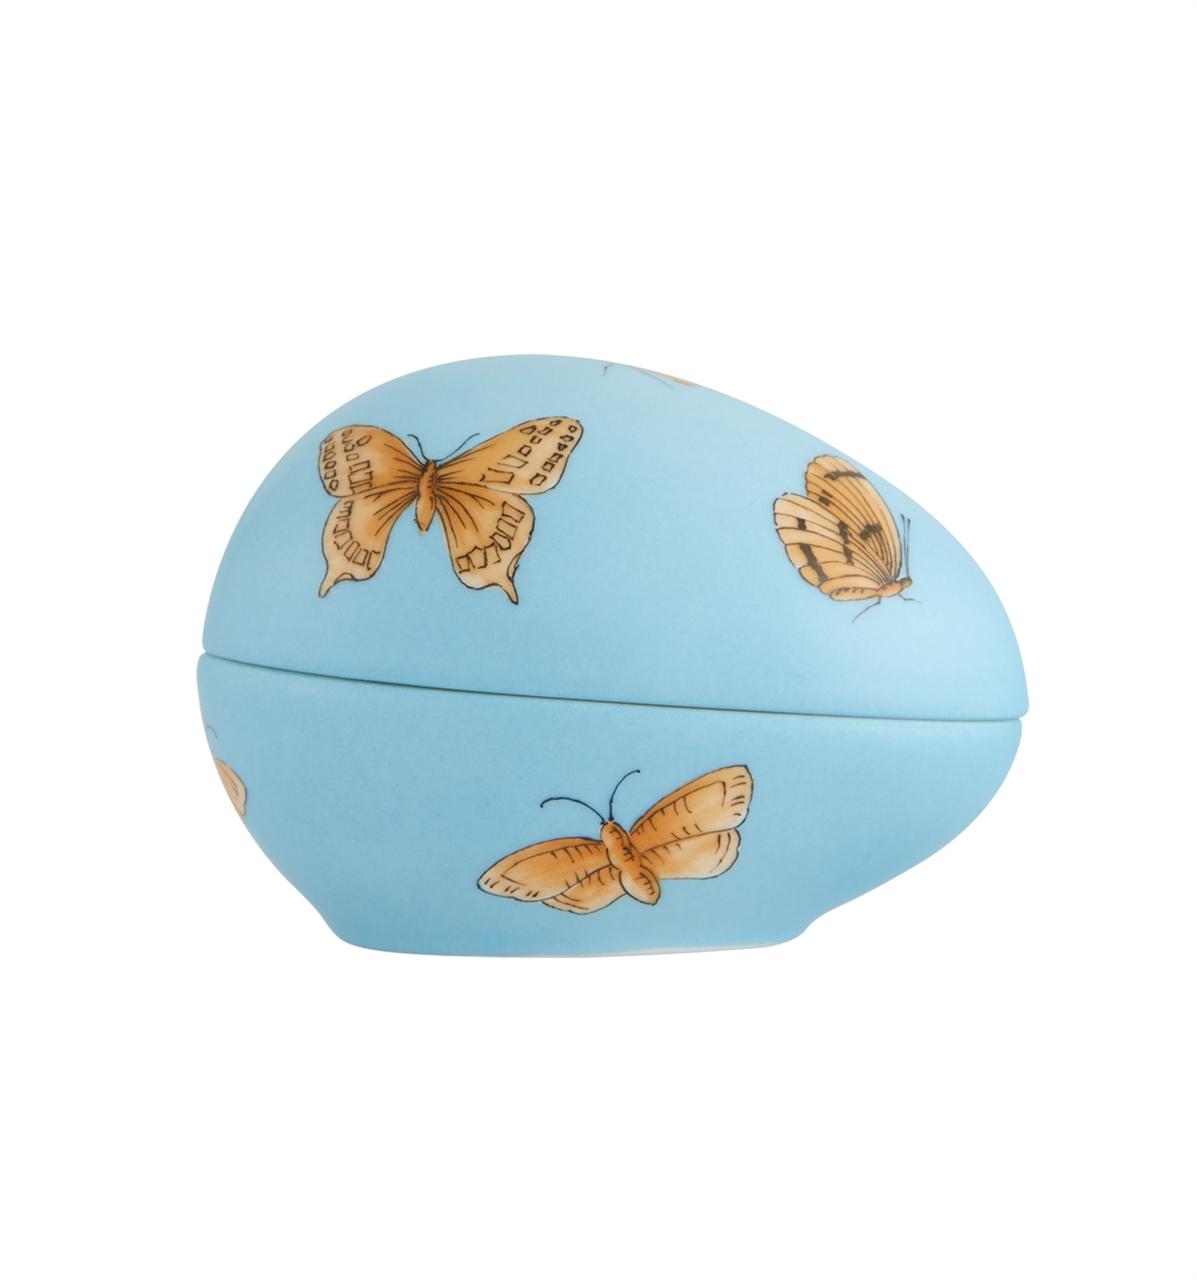 Vista Alegre Egg Box €105.00